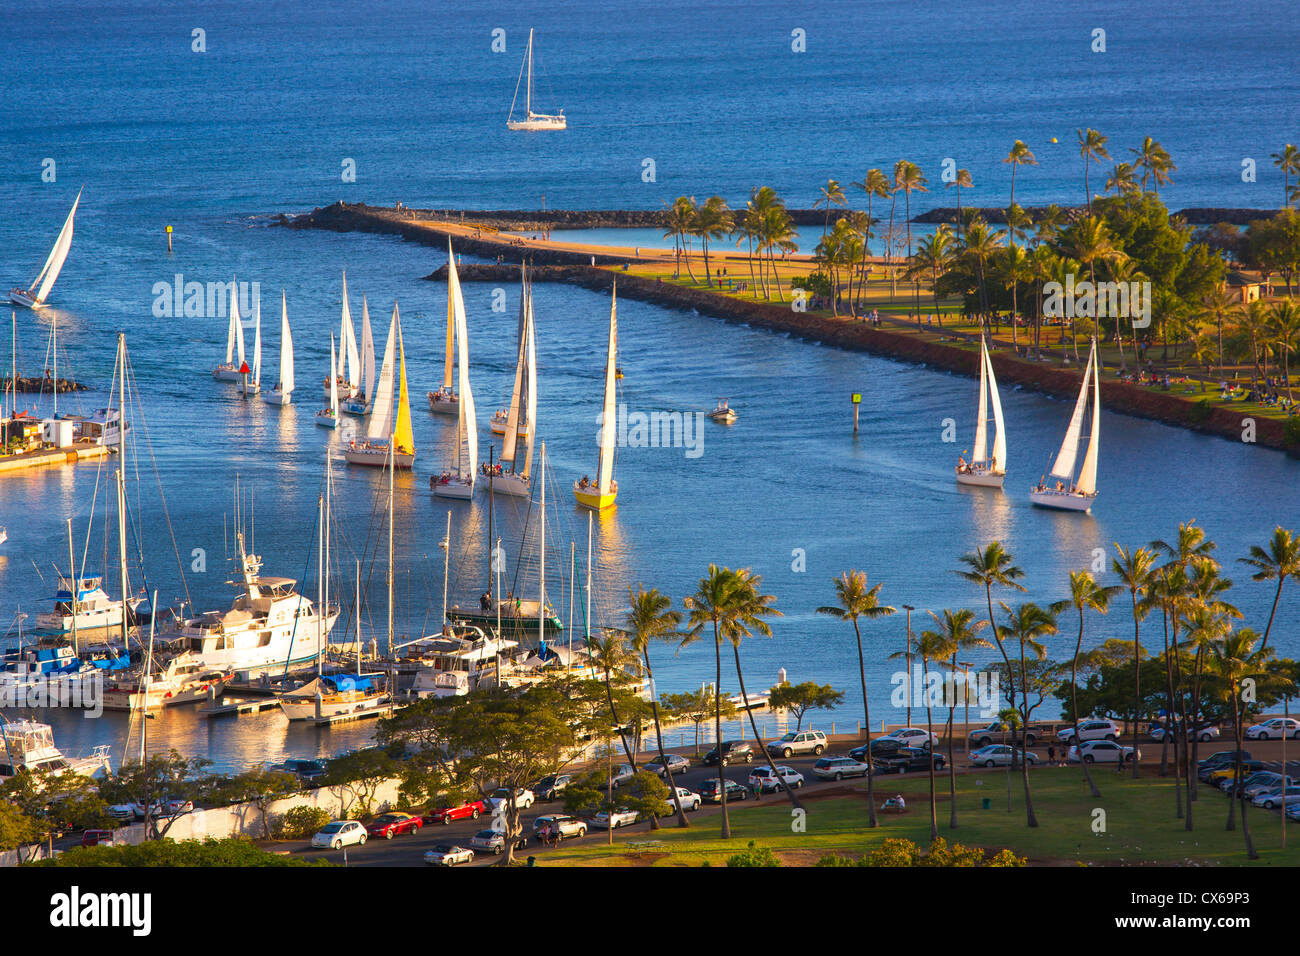 Ala Wai Yacht Harbor, Waikiki, Oahu, Hawaii - Stock Image